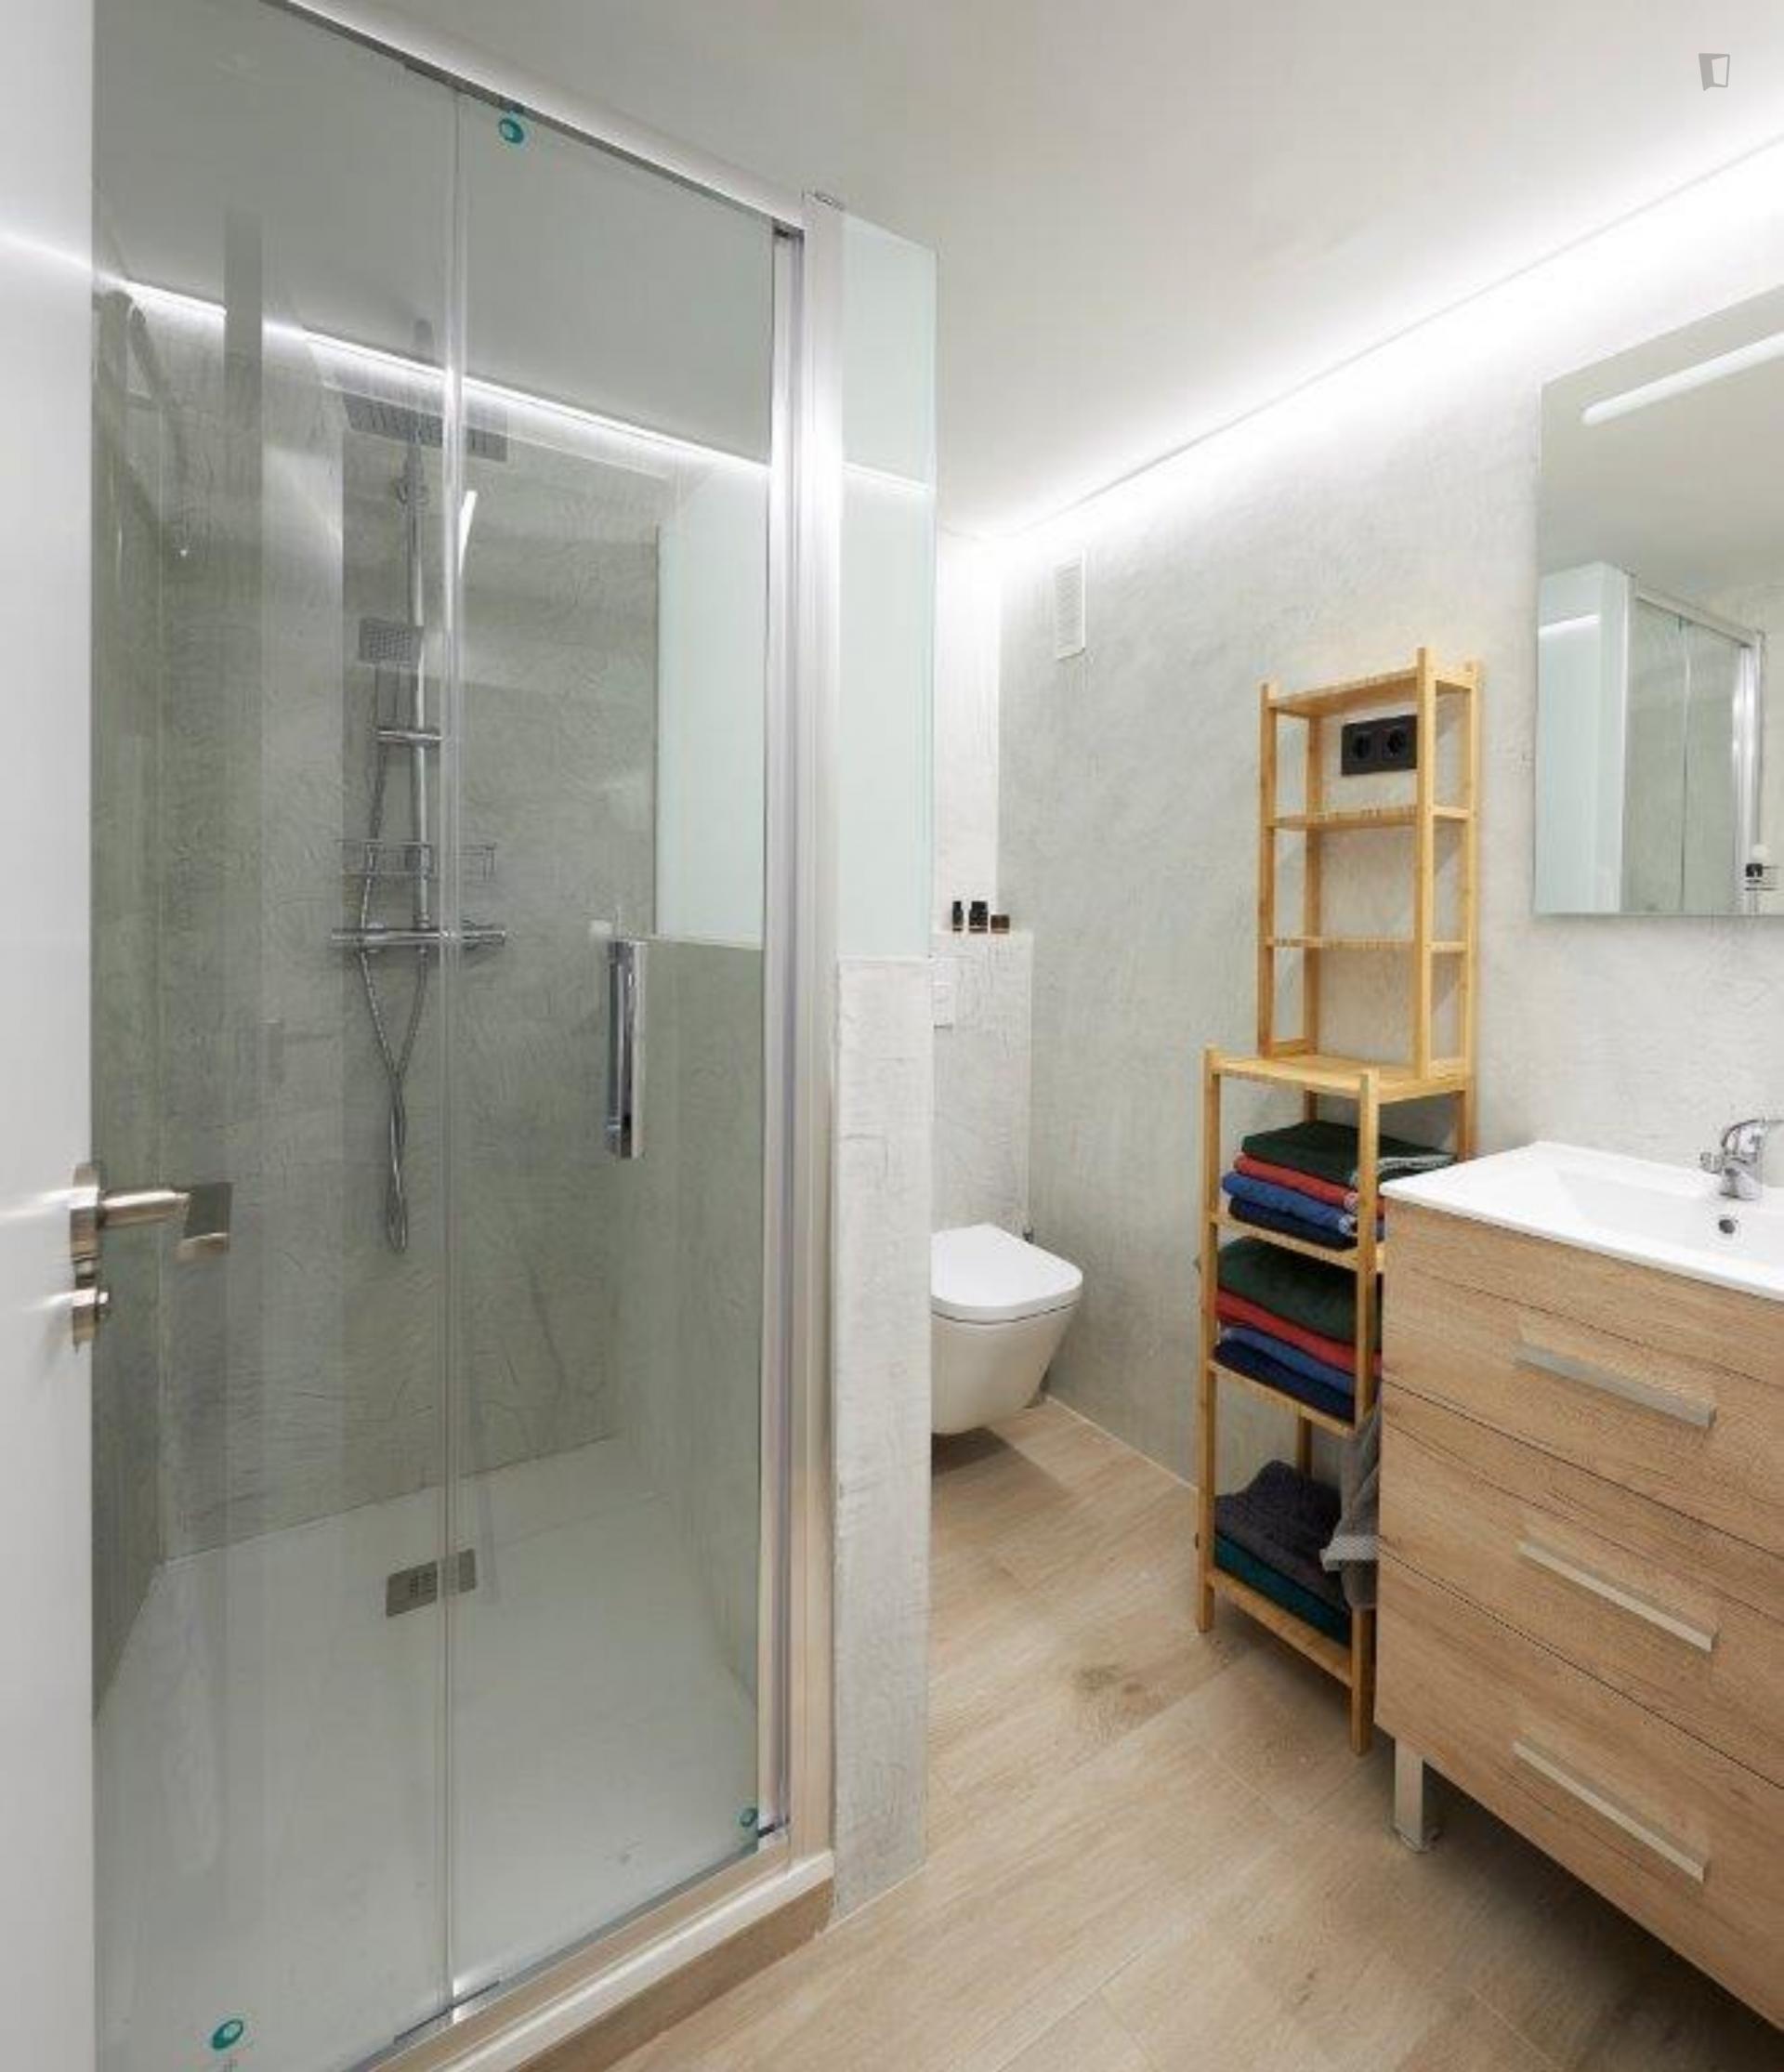 Arteaga - Acogedor apartamento Madrid